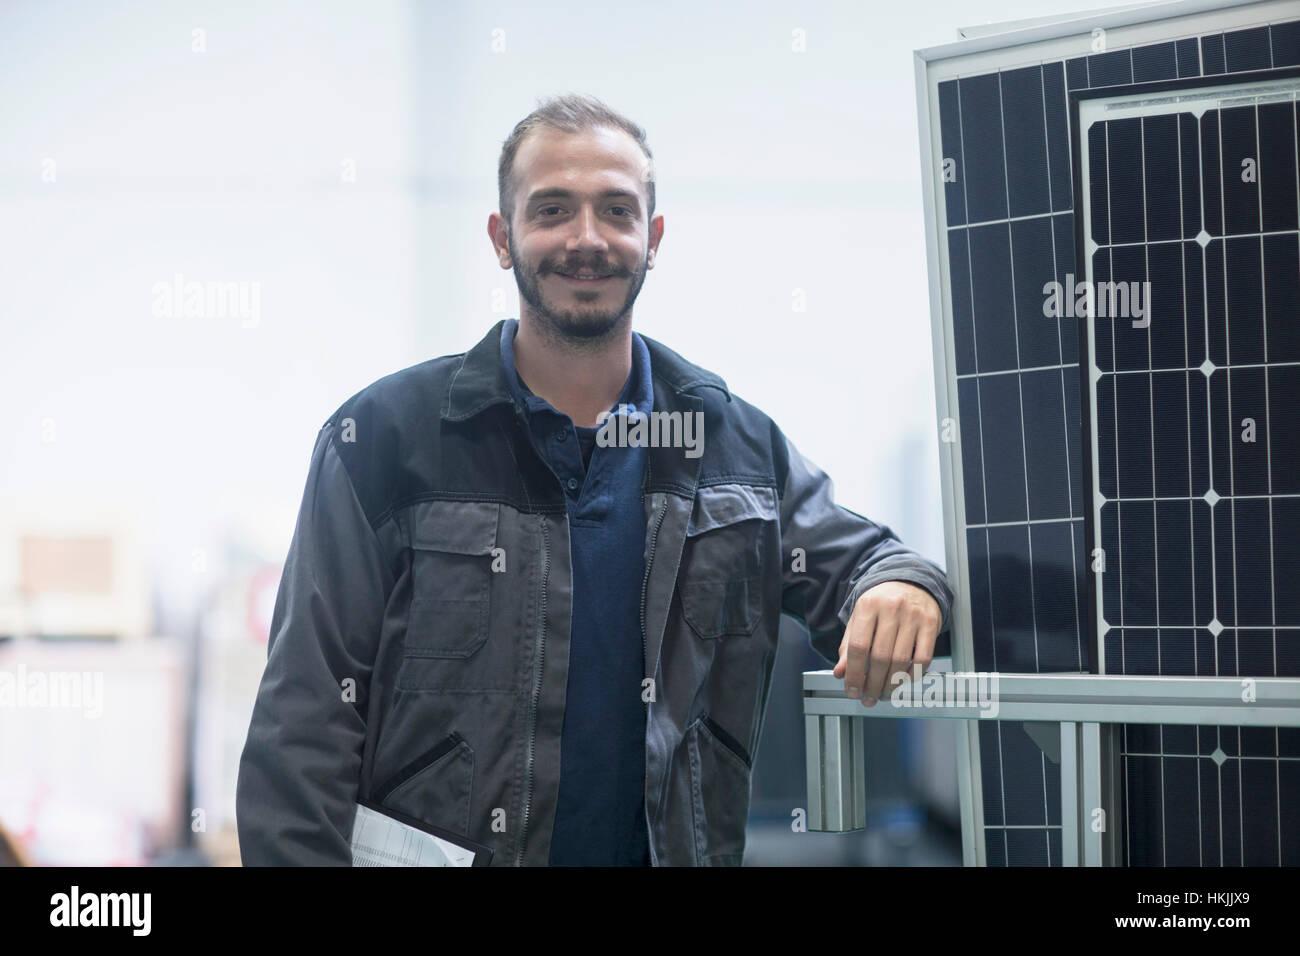 Confident store worker in warehouse, Freiburg im Breisgau, Baden-Württemberg, Germany - Stock Image